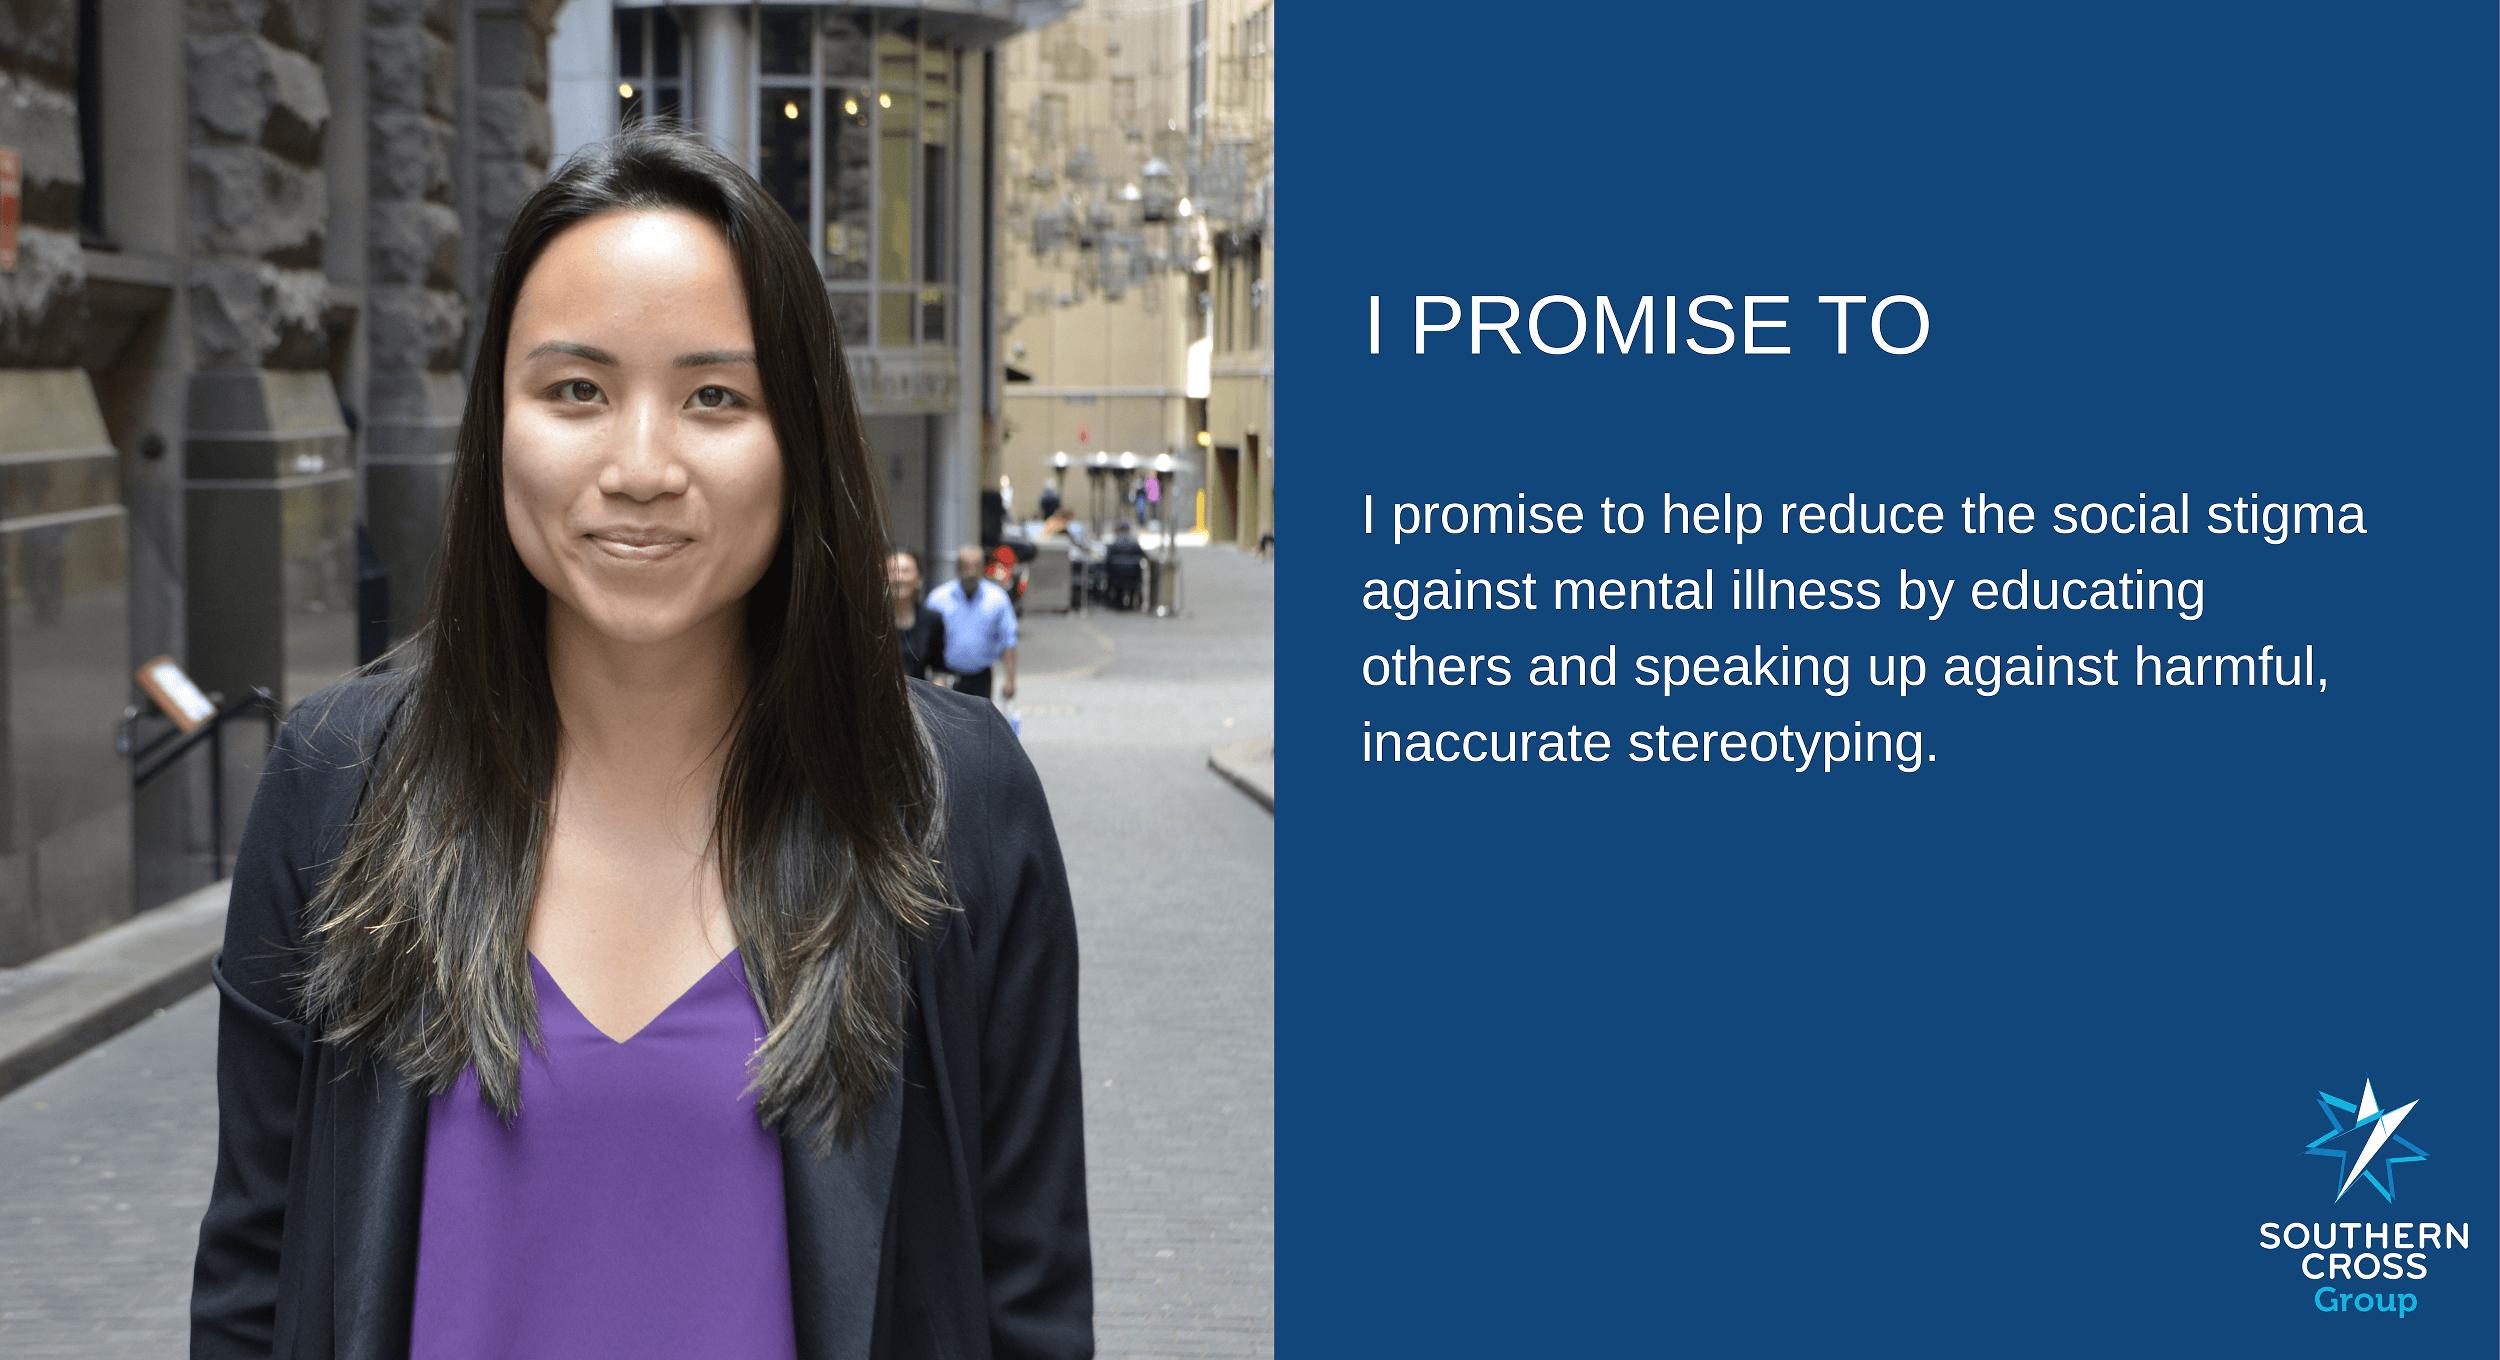 Emily promise